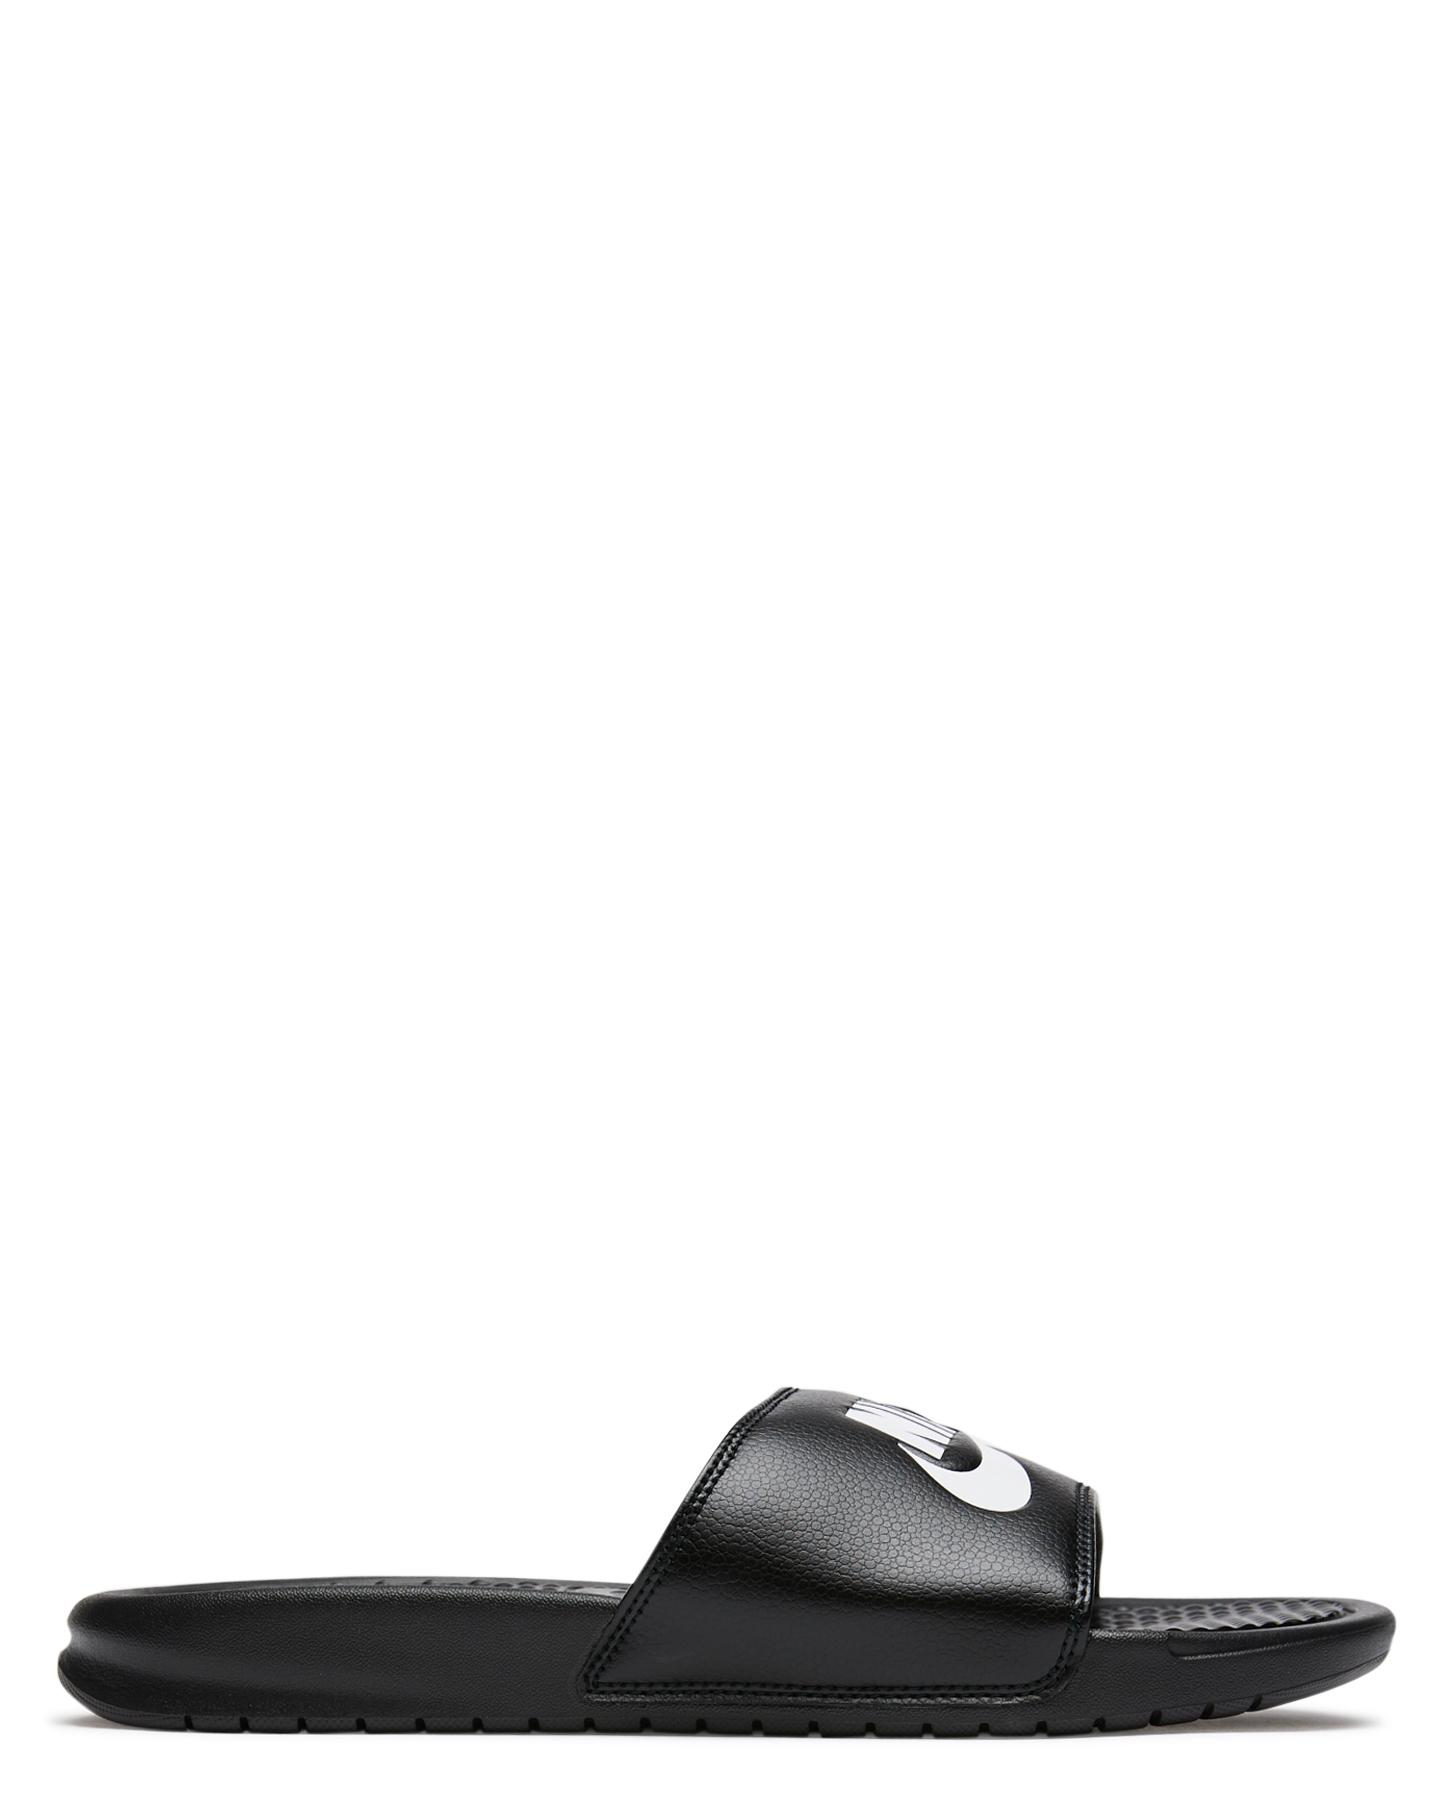 94499cbfb BLACK WHITE MENS FOOTWEAR NIKE SLIDES - SS343880-090M ...